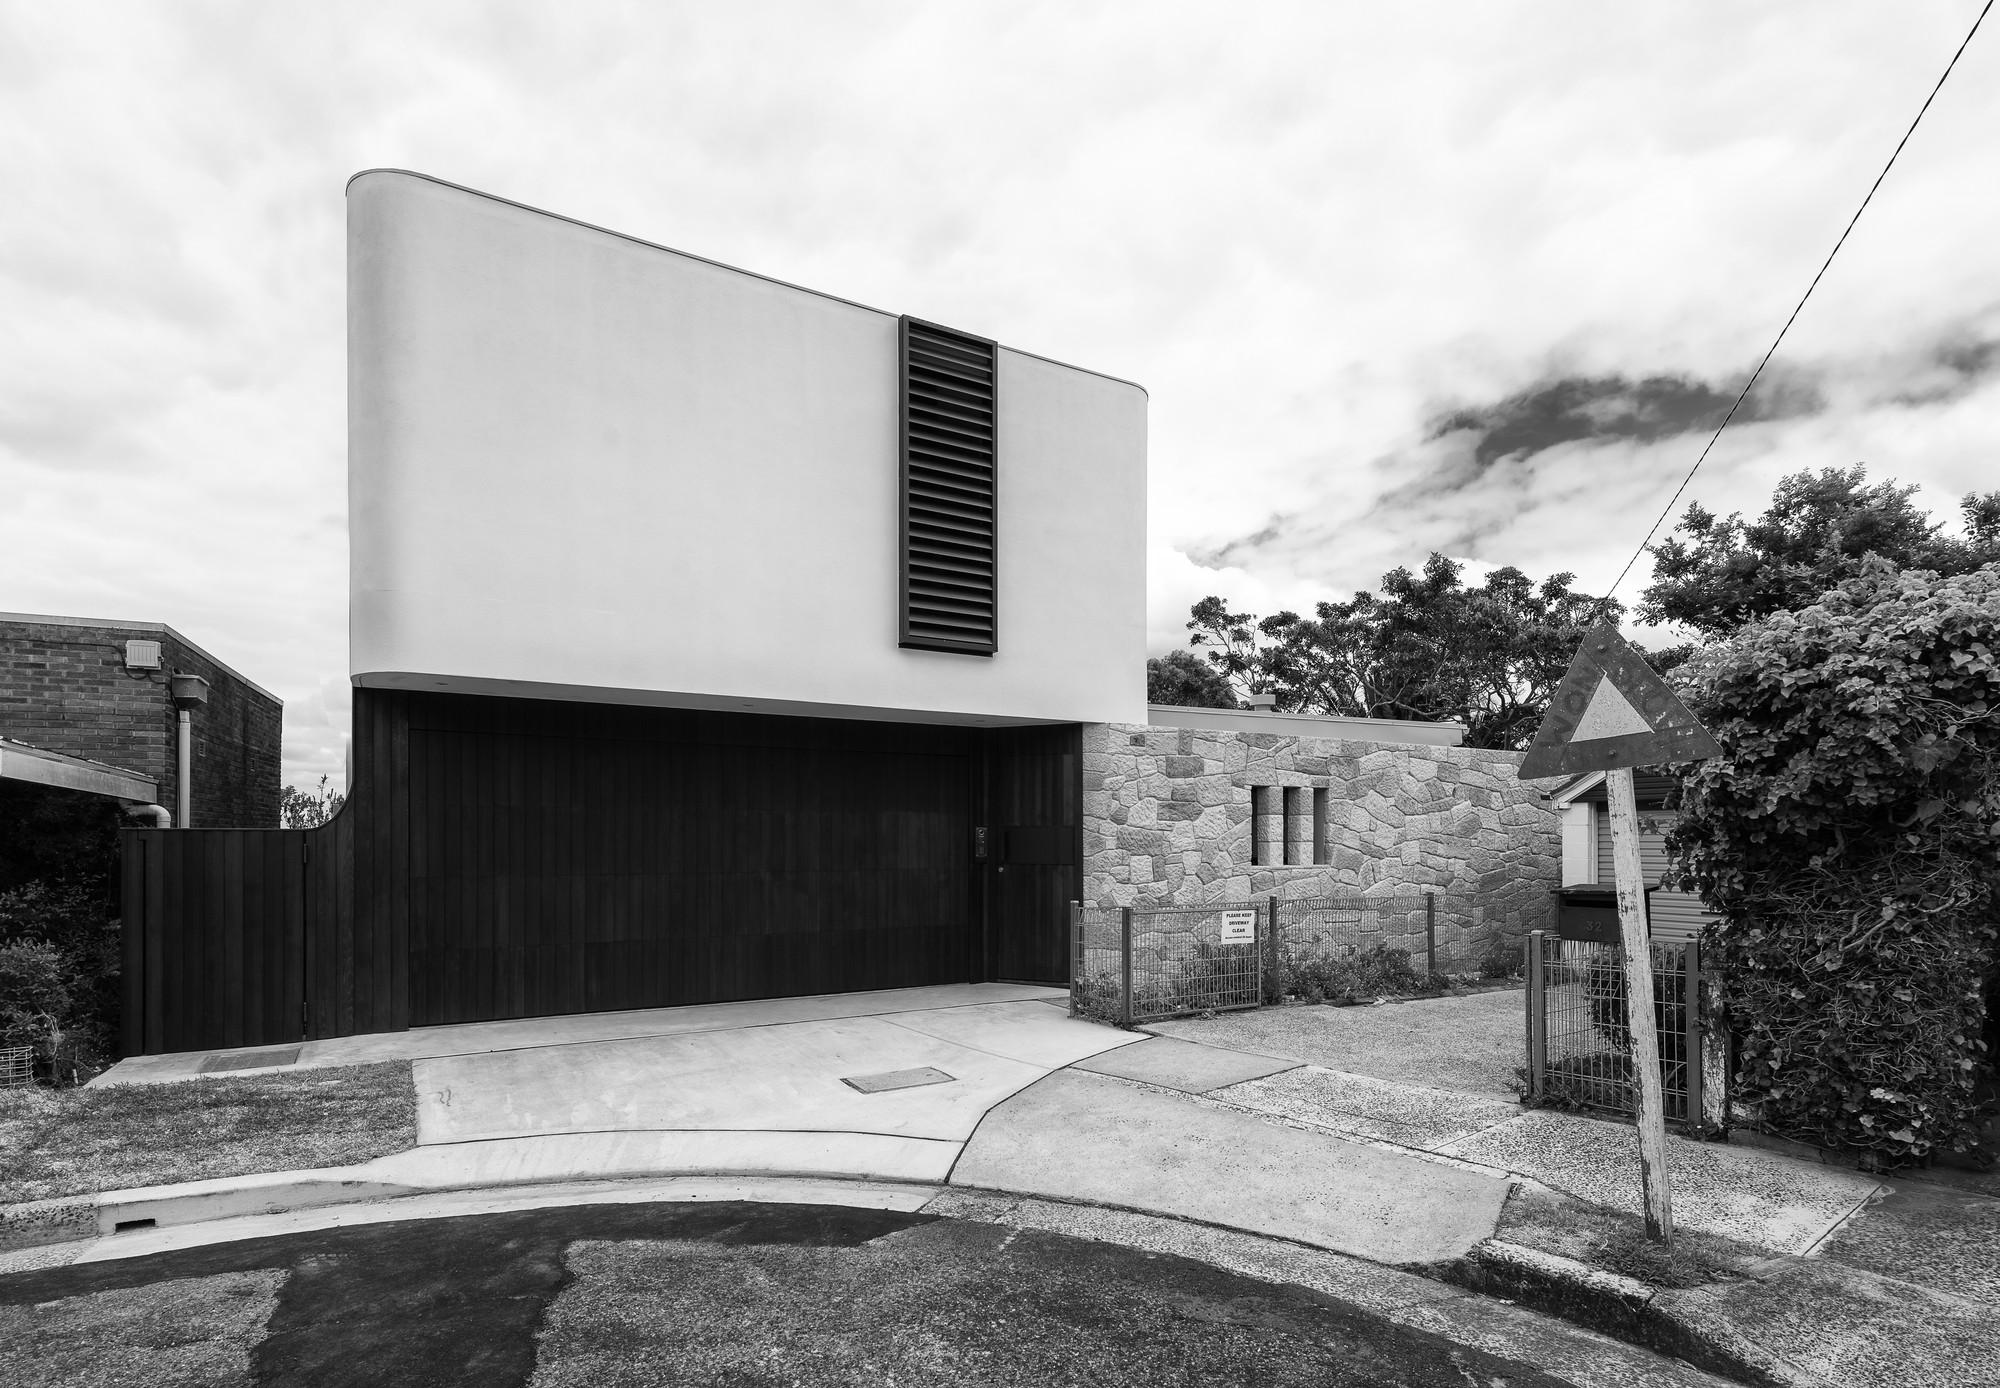 Cliff top house luigi roselli archdaily - Maison cliff top luigi rosselli architects ...